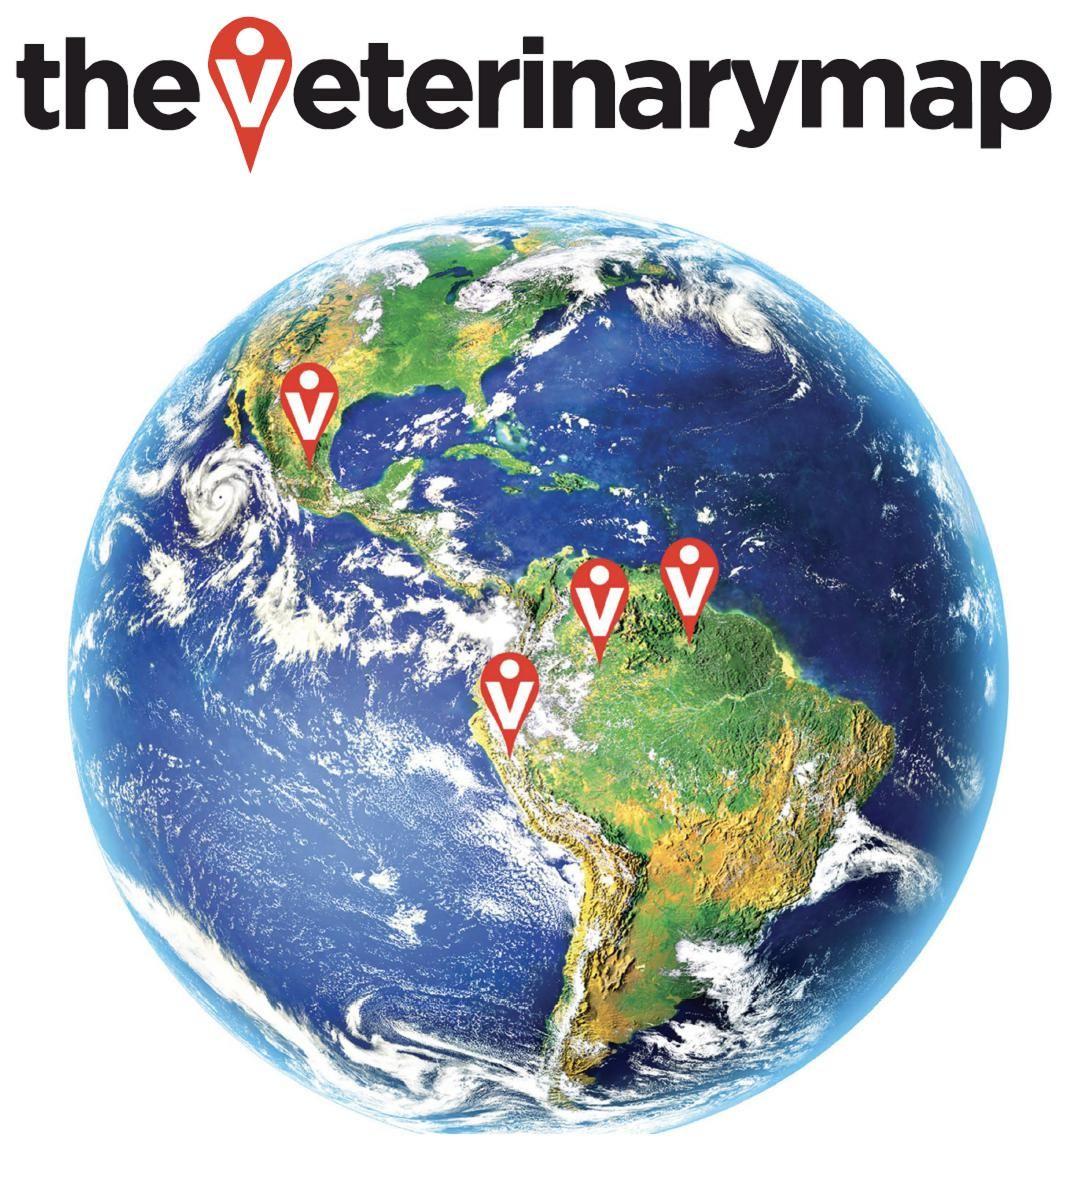 The Veterinary Map